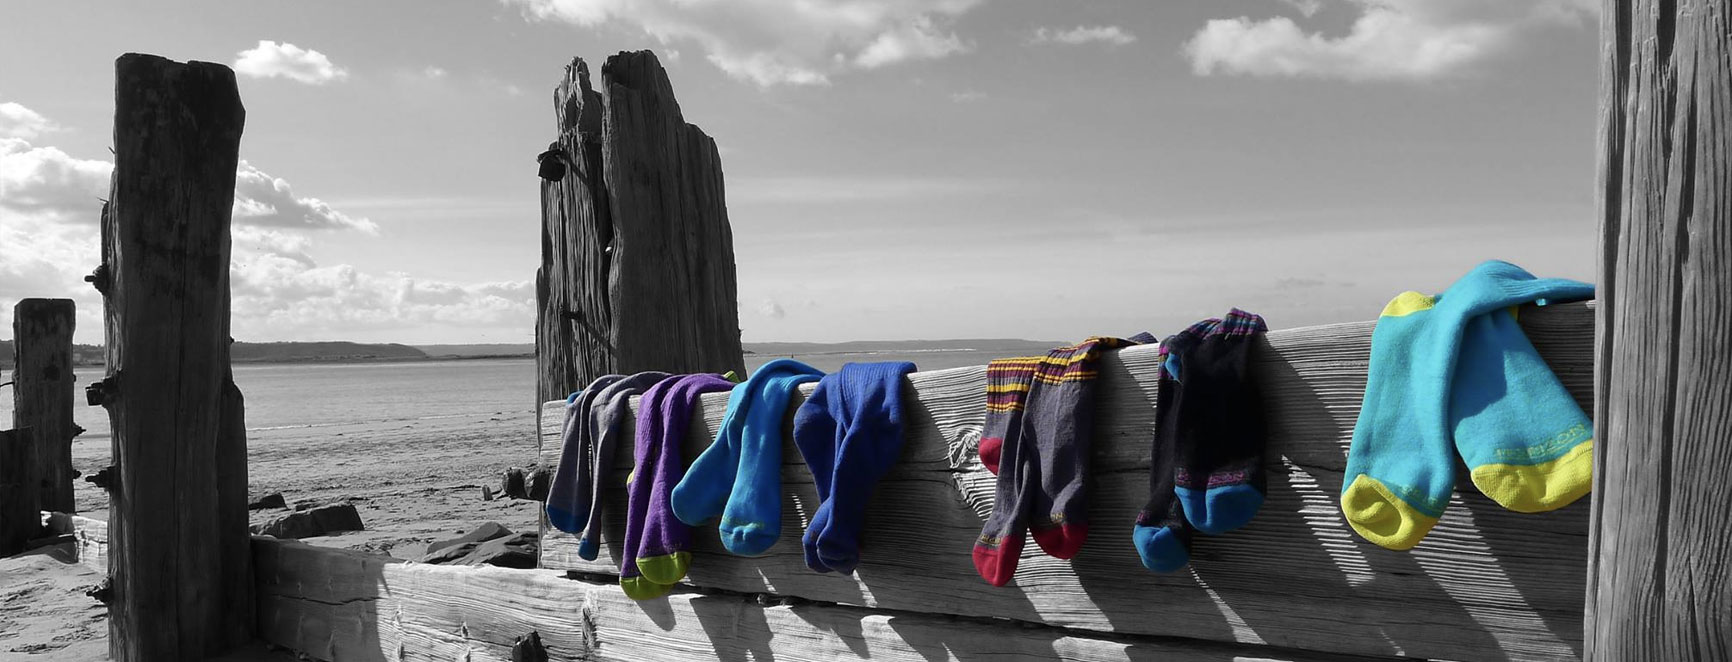 Horizon Socks on Beach